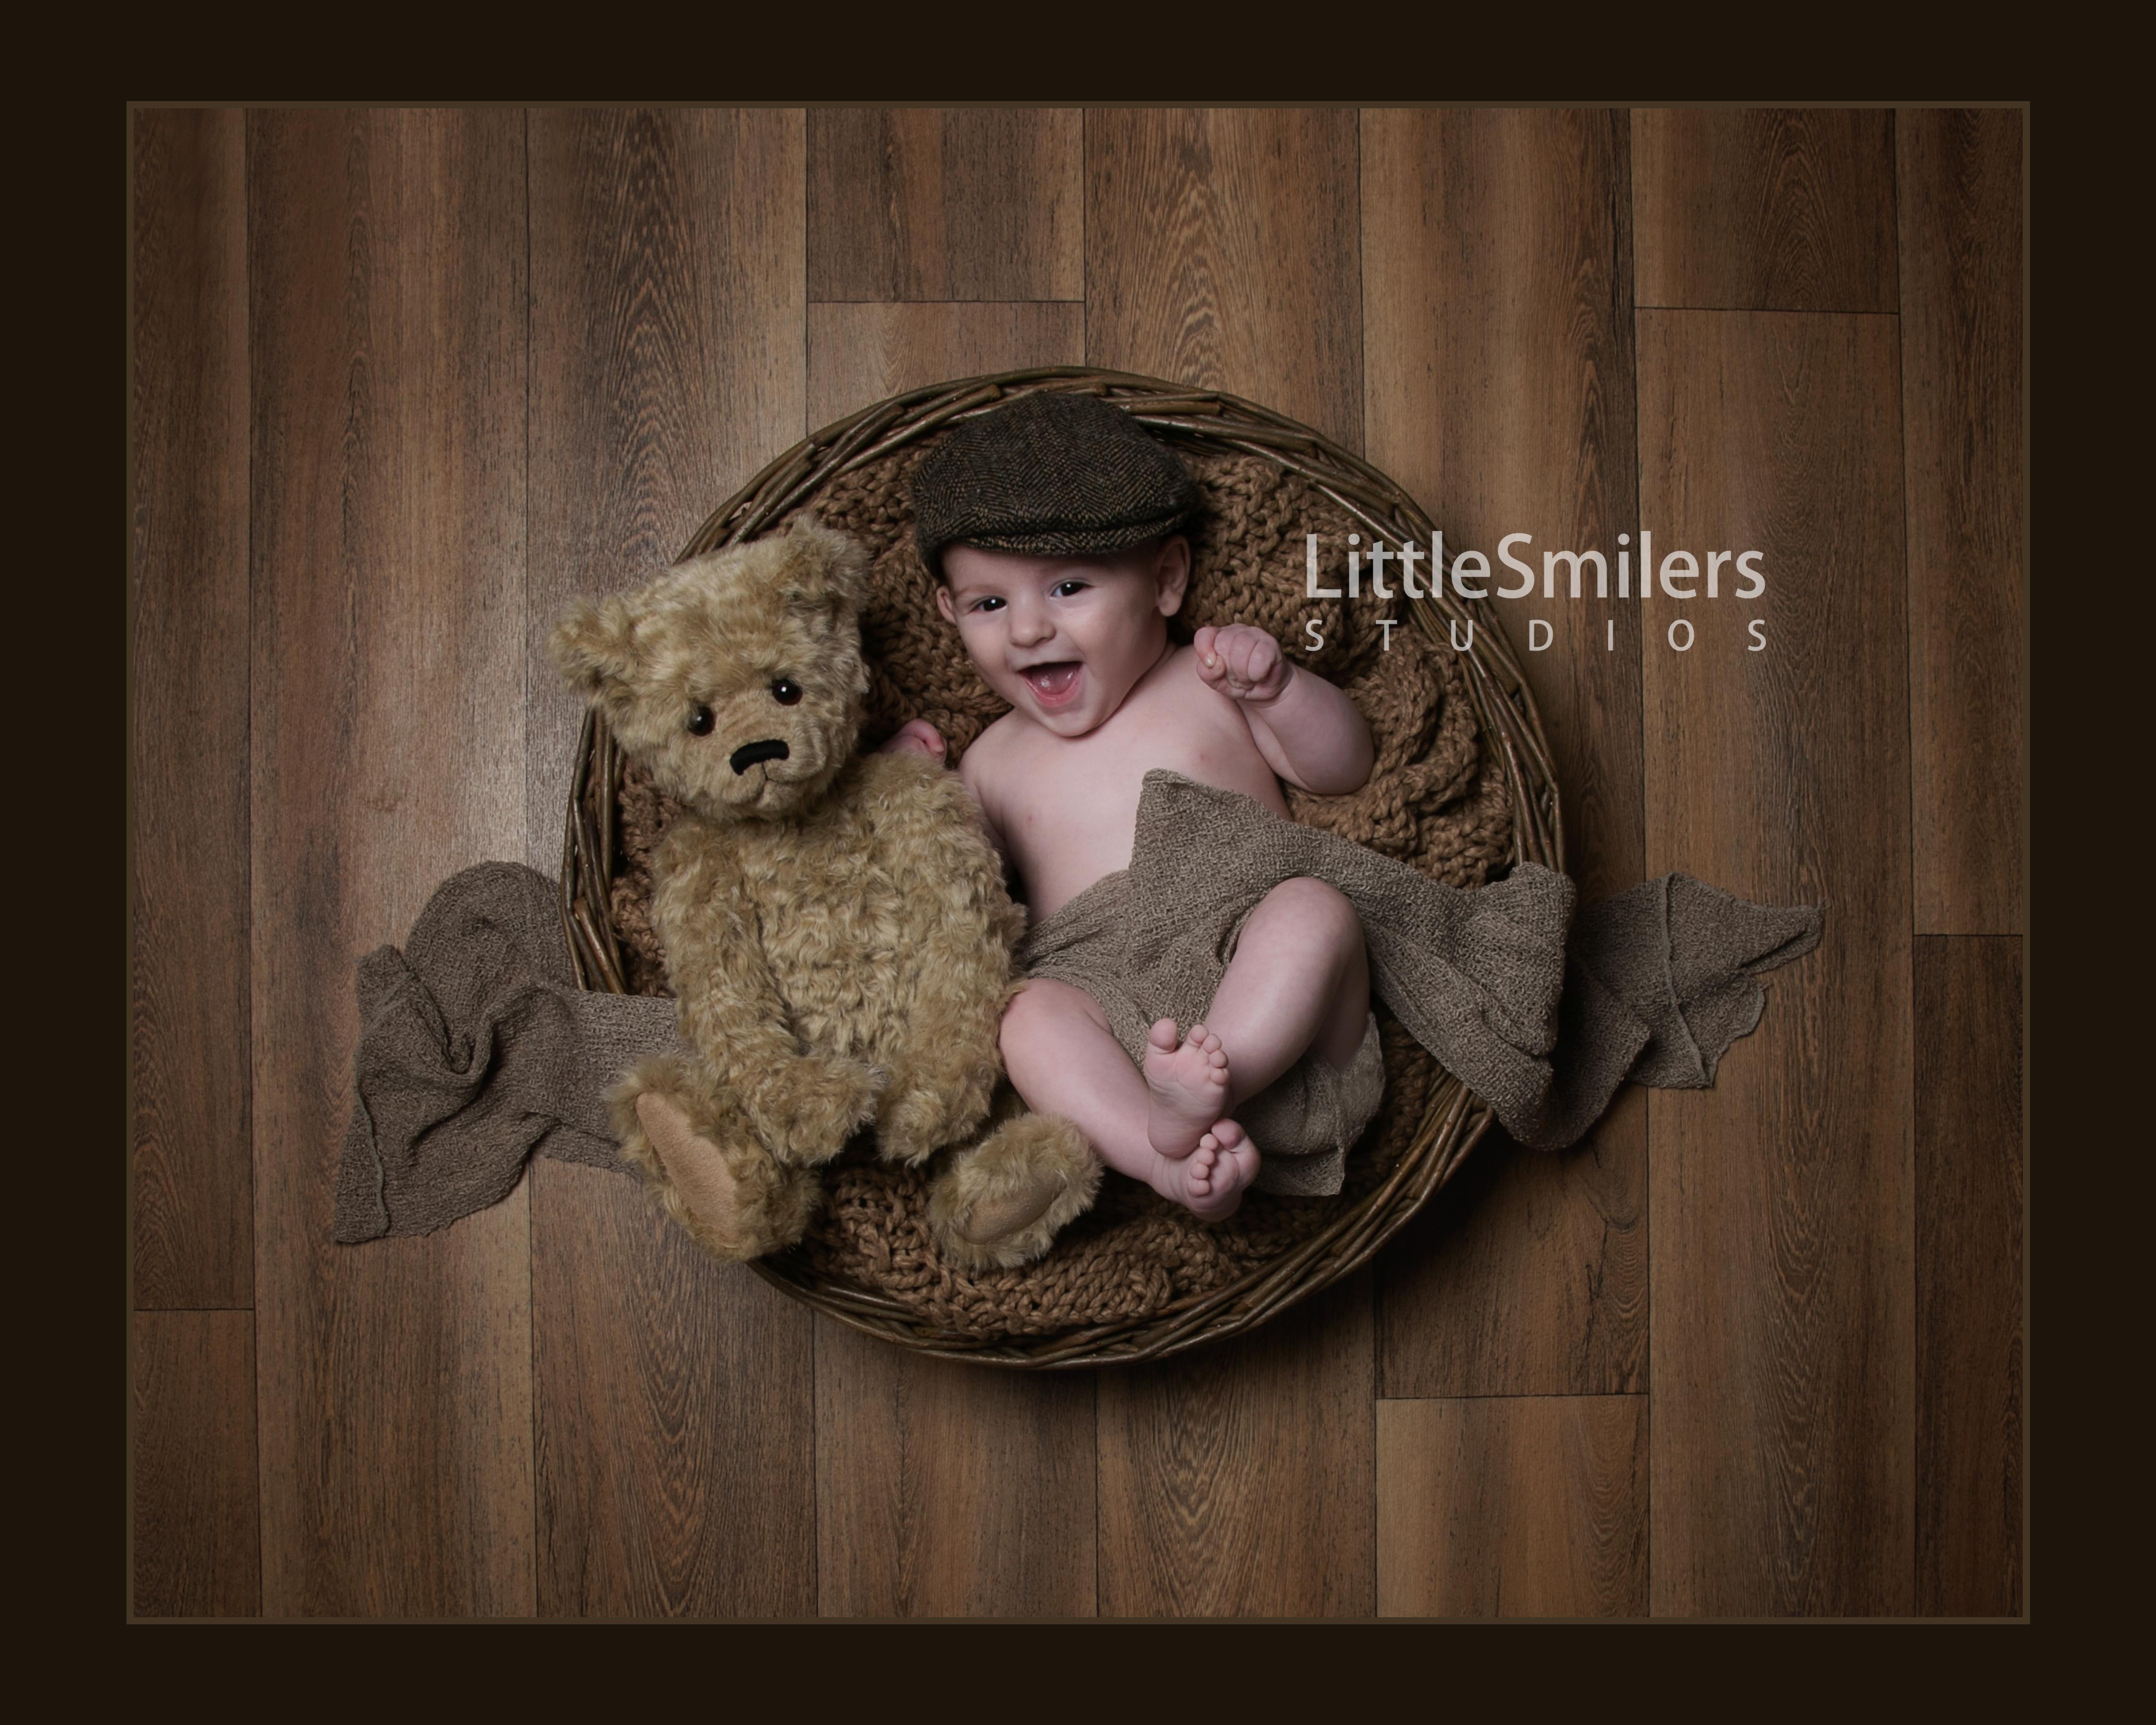 Little Smilers